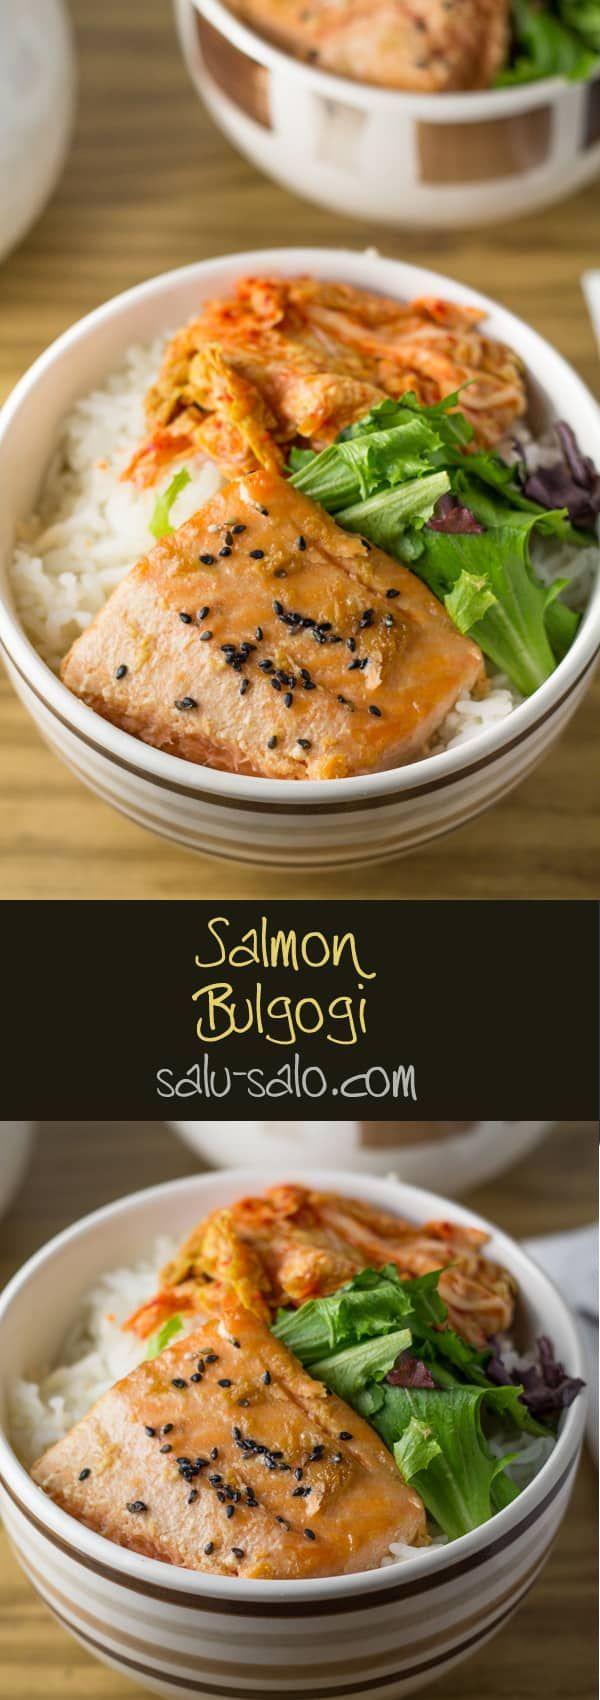 Salmon Bulgogi (Korean Style Marinated Salmon   Bulgogi ...